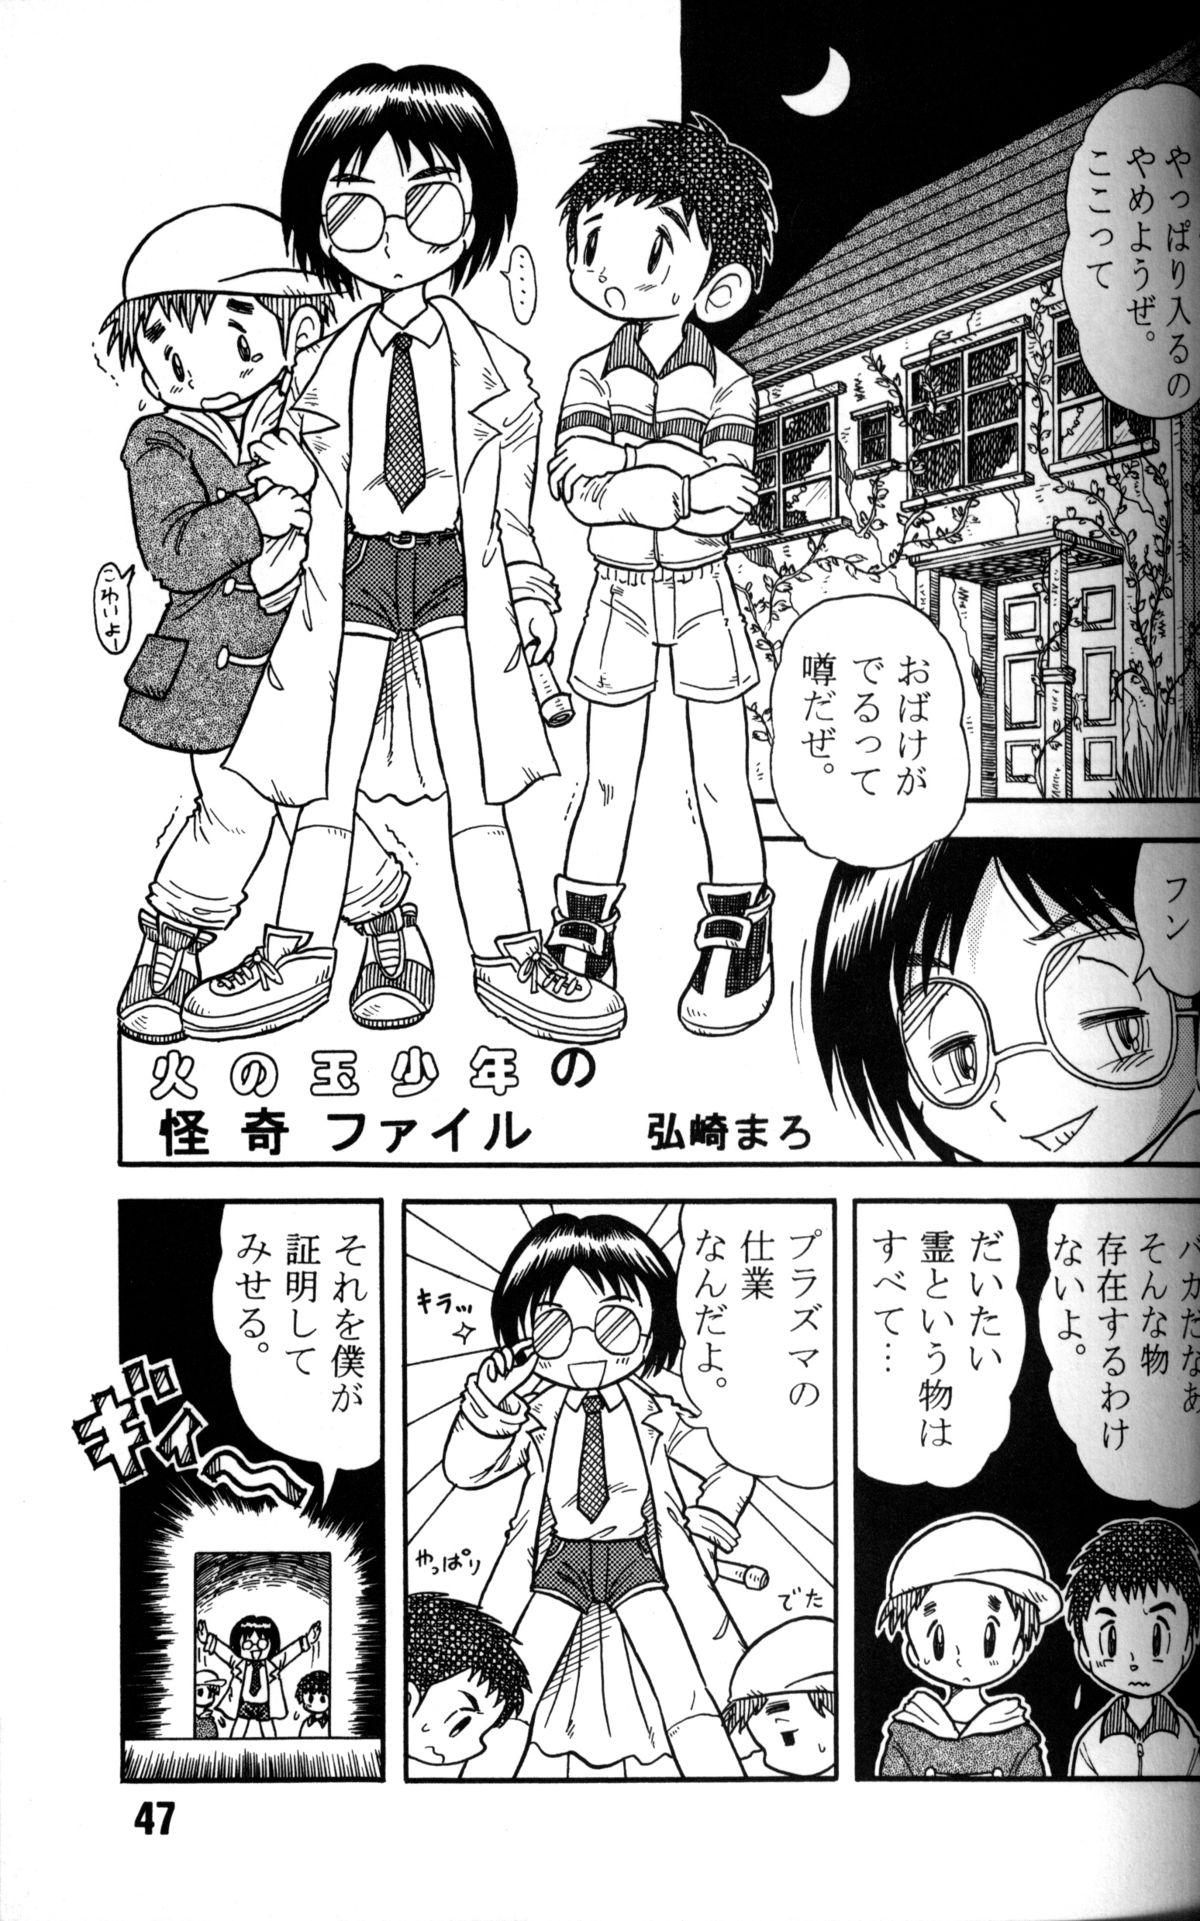 Anthology - Nekketsu Project - Volume 4 'Shounen Vanilla Essence' 45